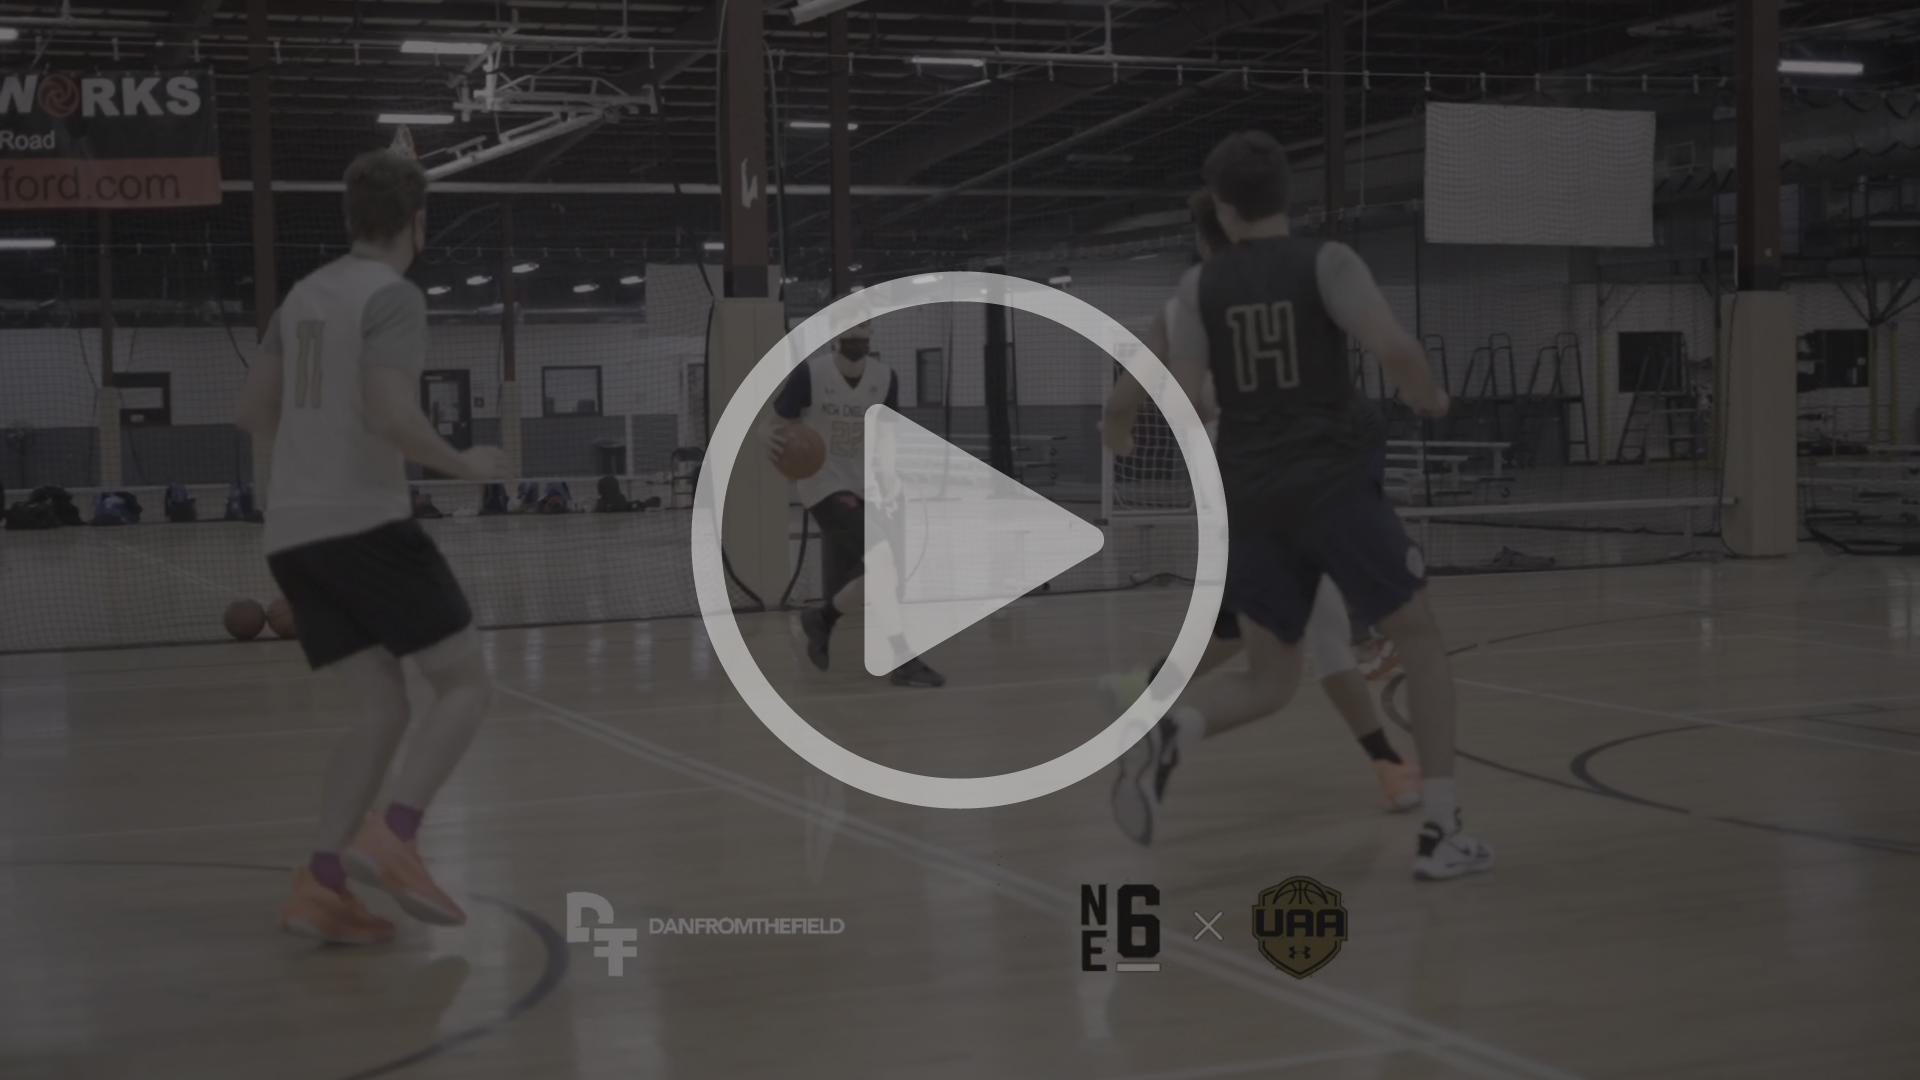 Video of NE6 training group classes.